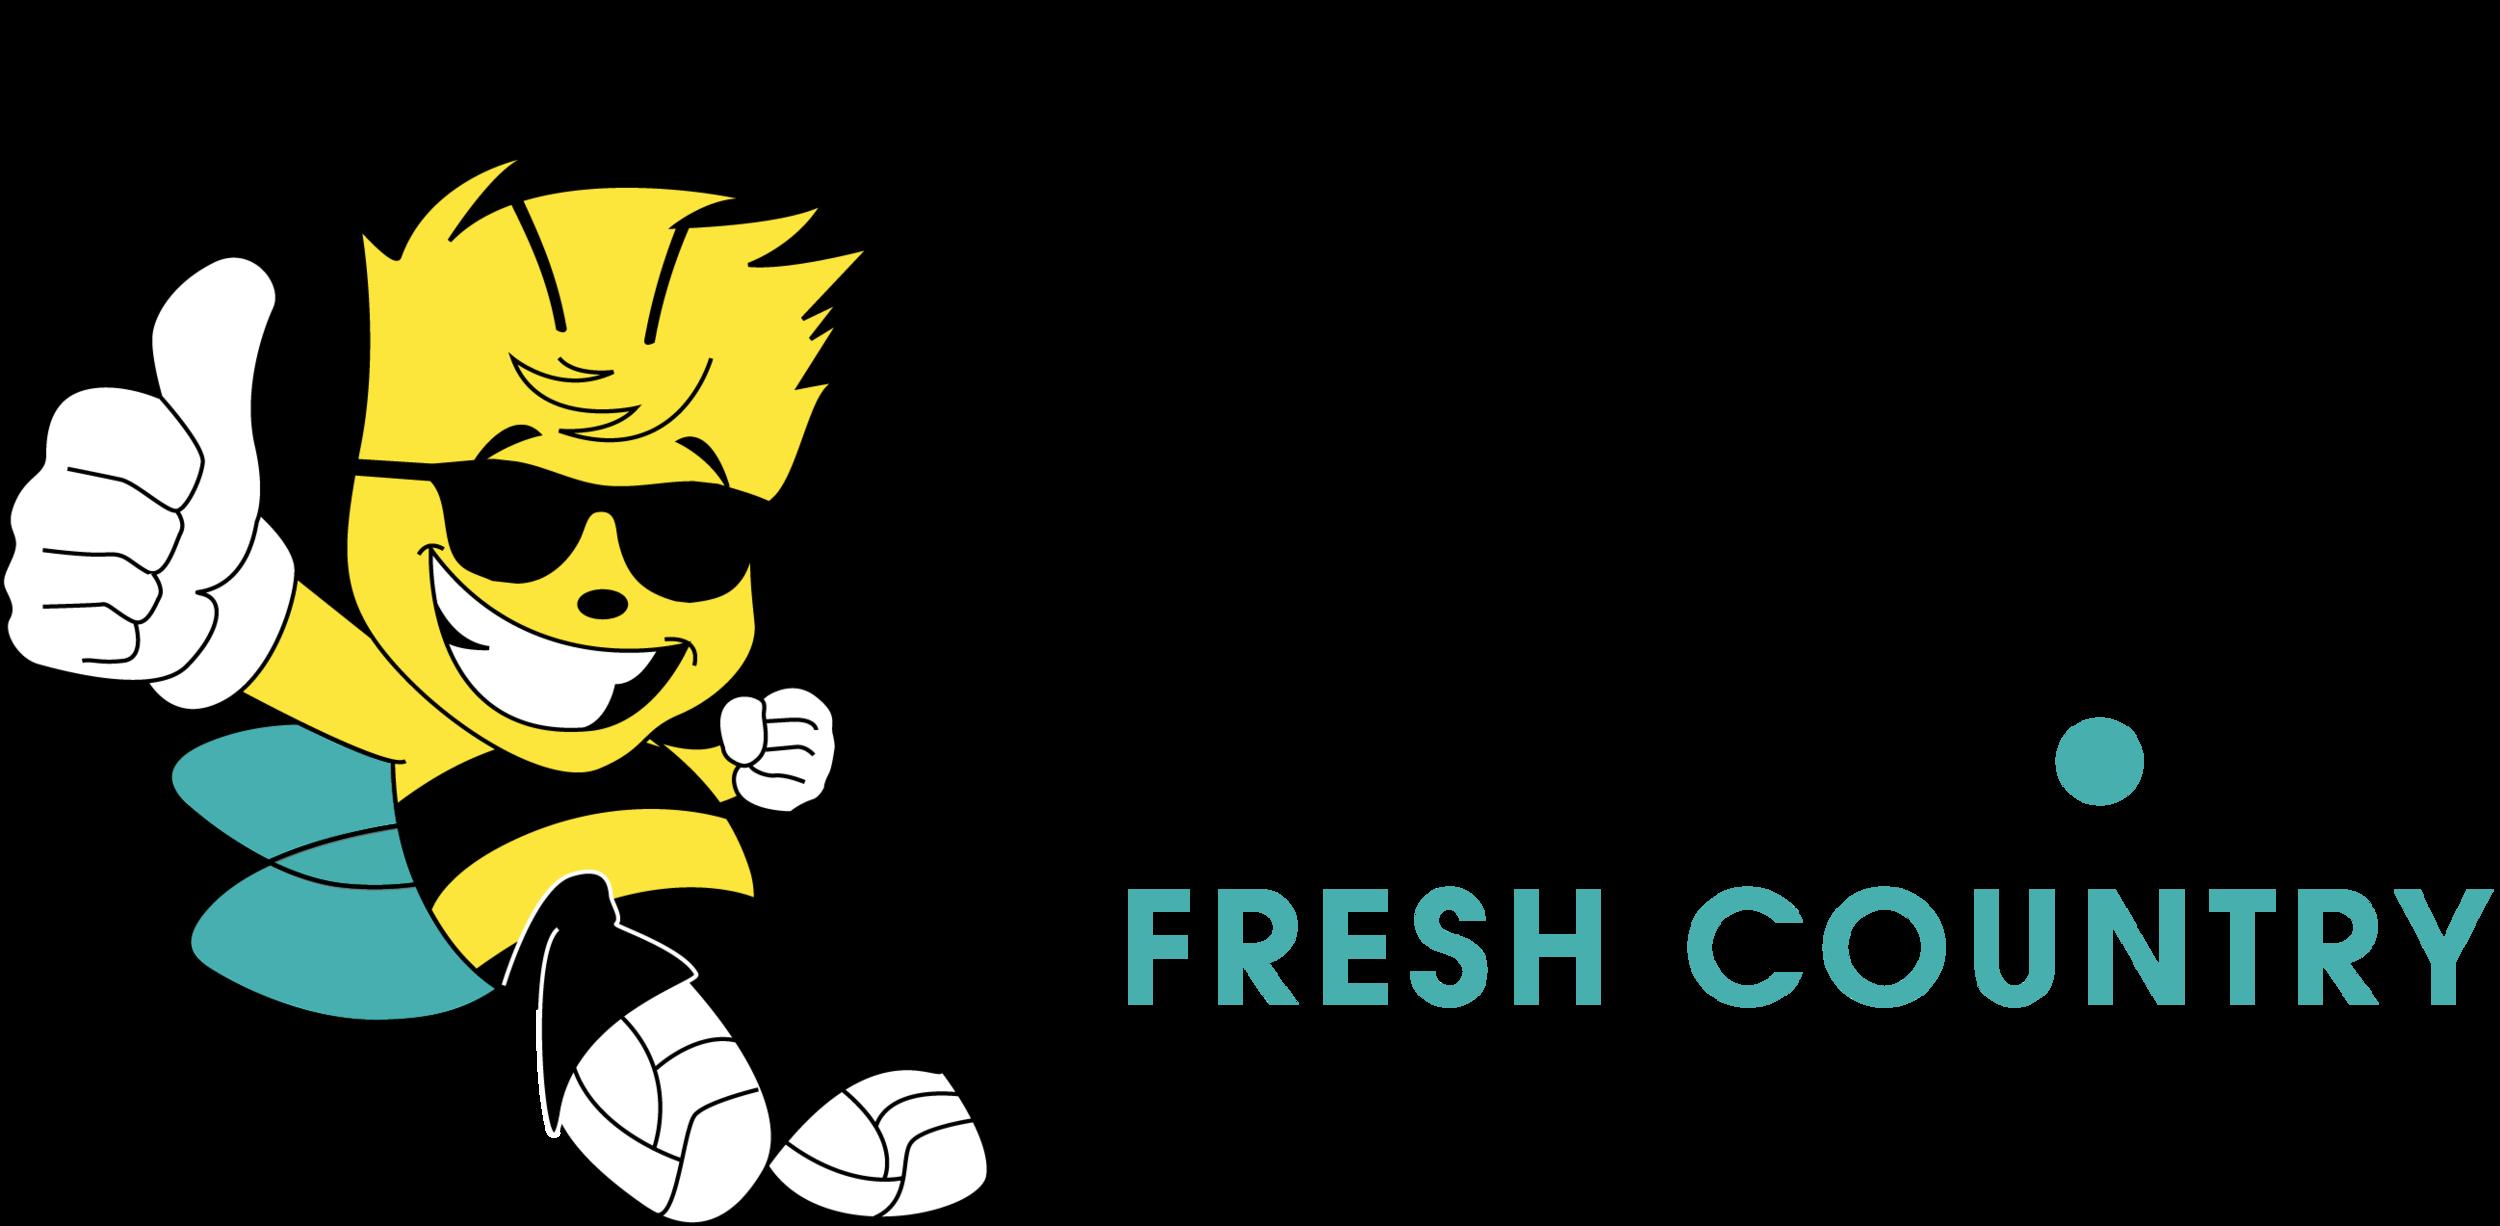 B94.7 FM Fresh Country